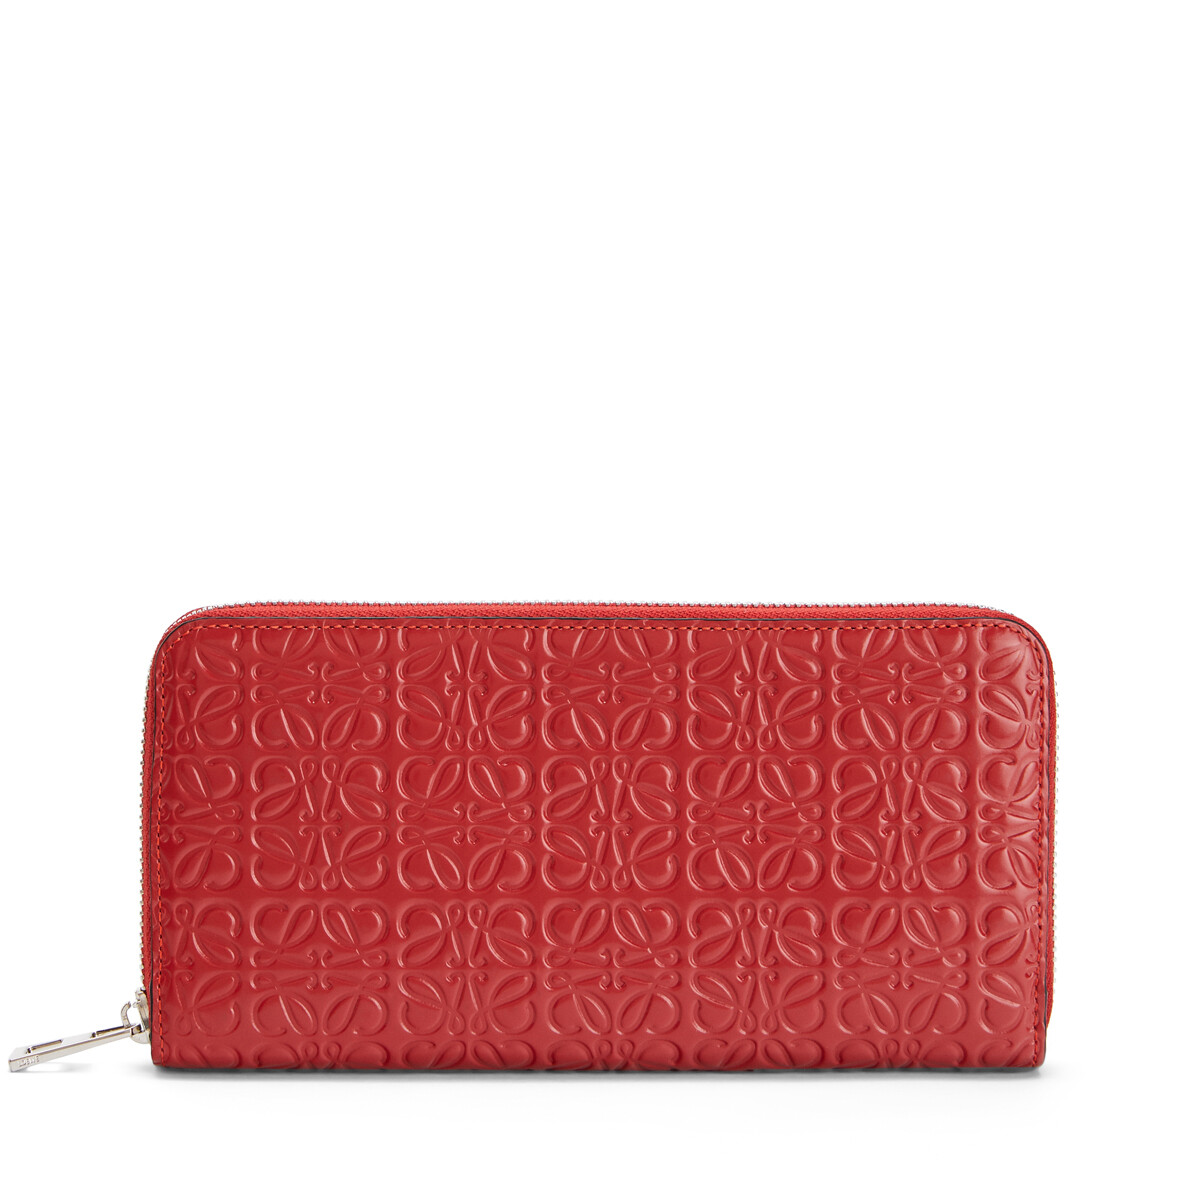 LOEWE(ロエベ)の人気レディース財布